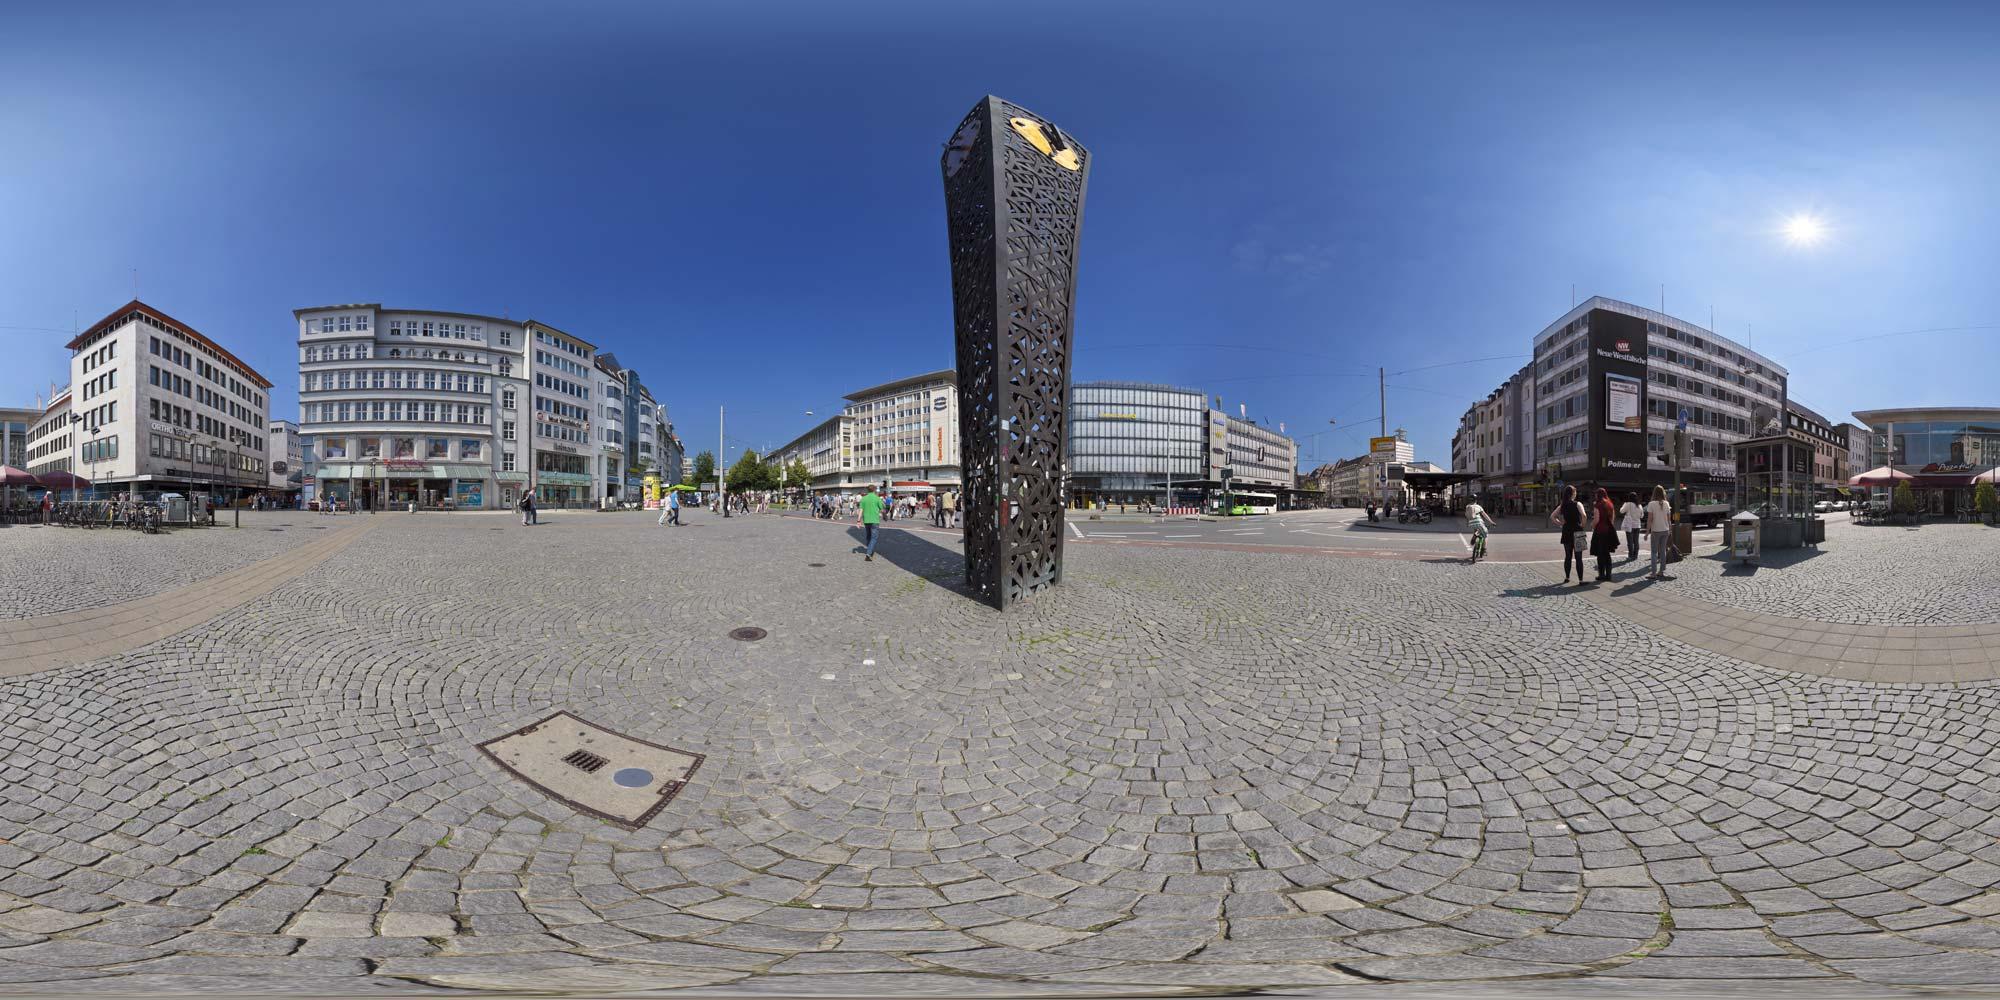 Bielefeld Jahnplatz besides F D Bb B also Ai likewise I Xpdn G O besides . on f p